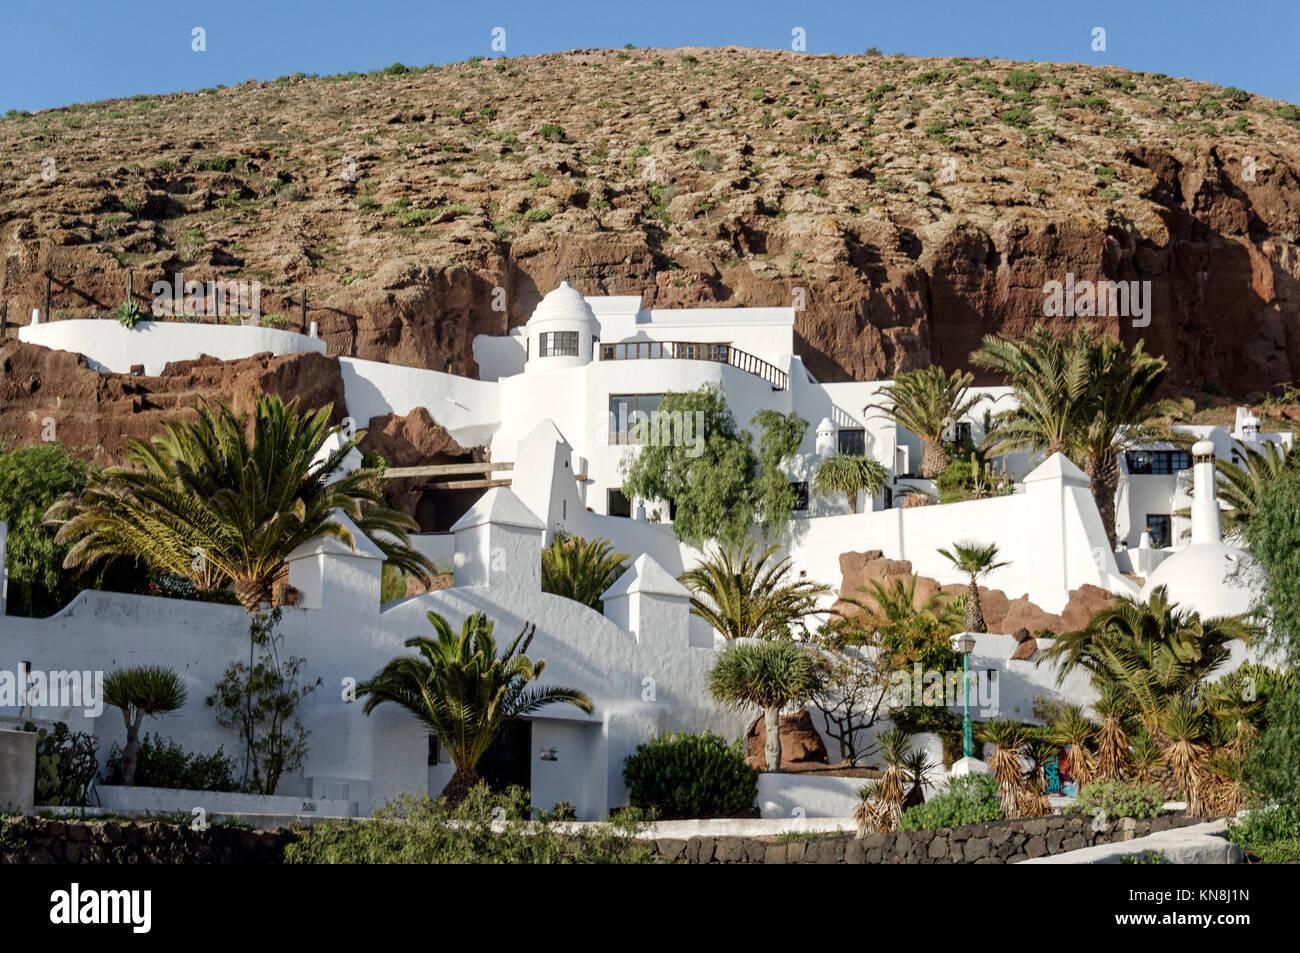 Lagomar House Museum Nazaret , Casa Sharif Omar , Lanzarote - Stock Image